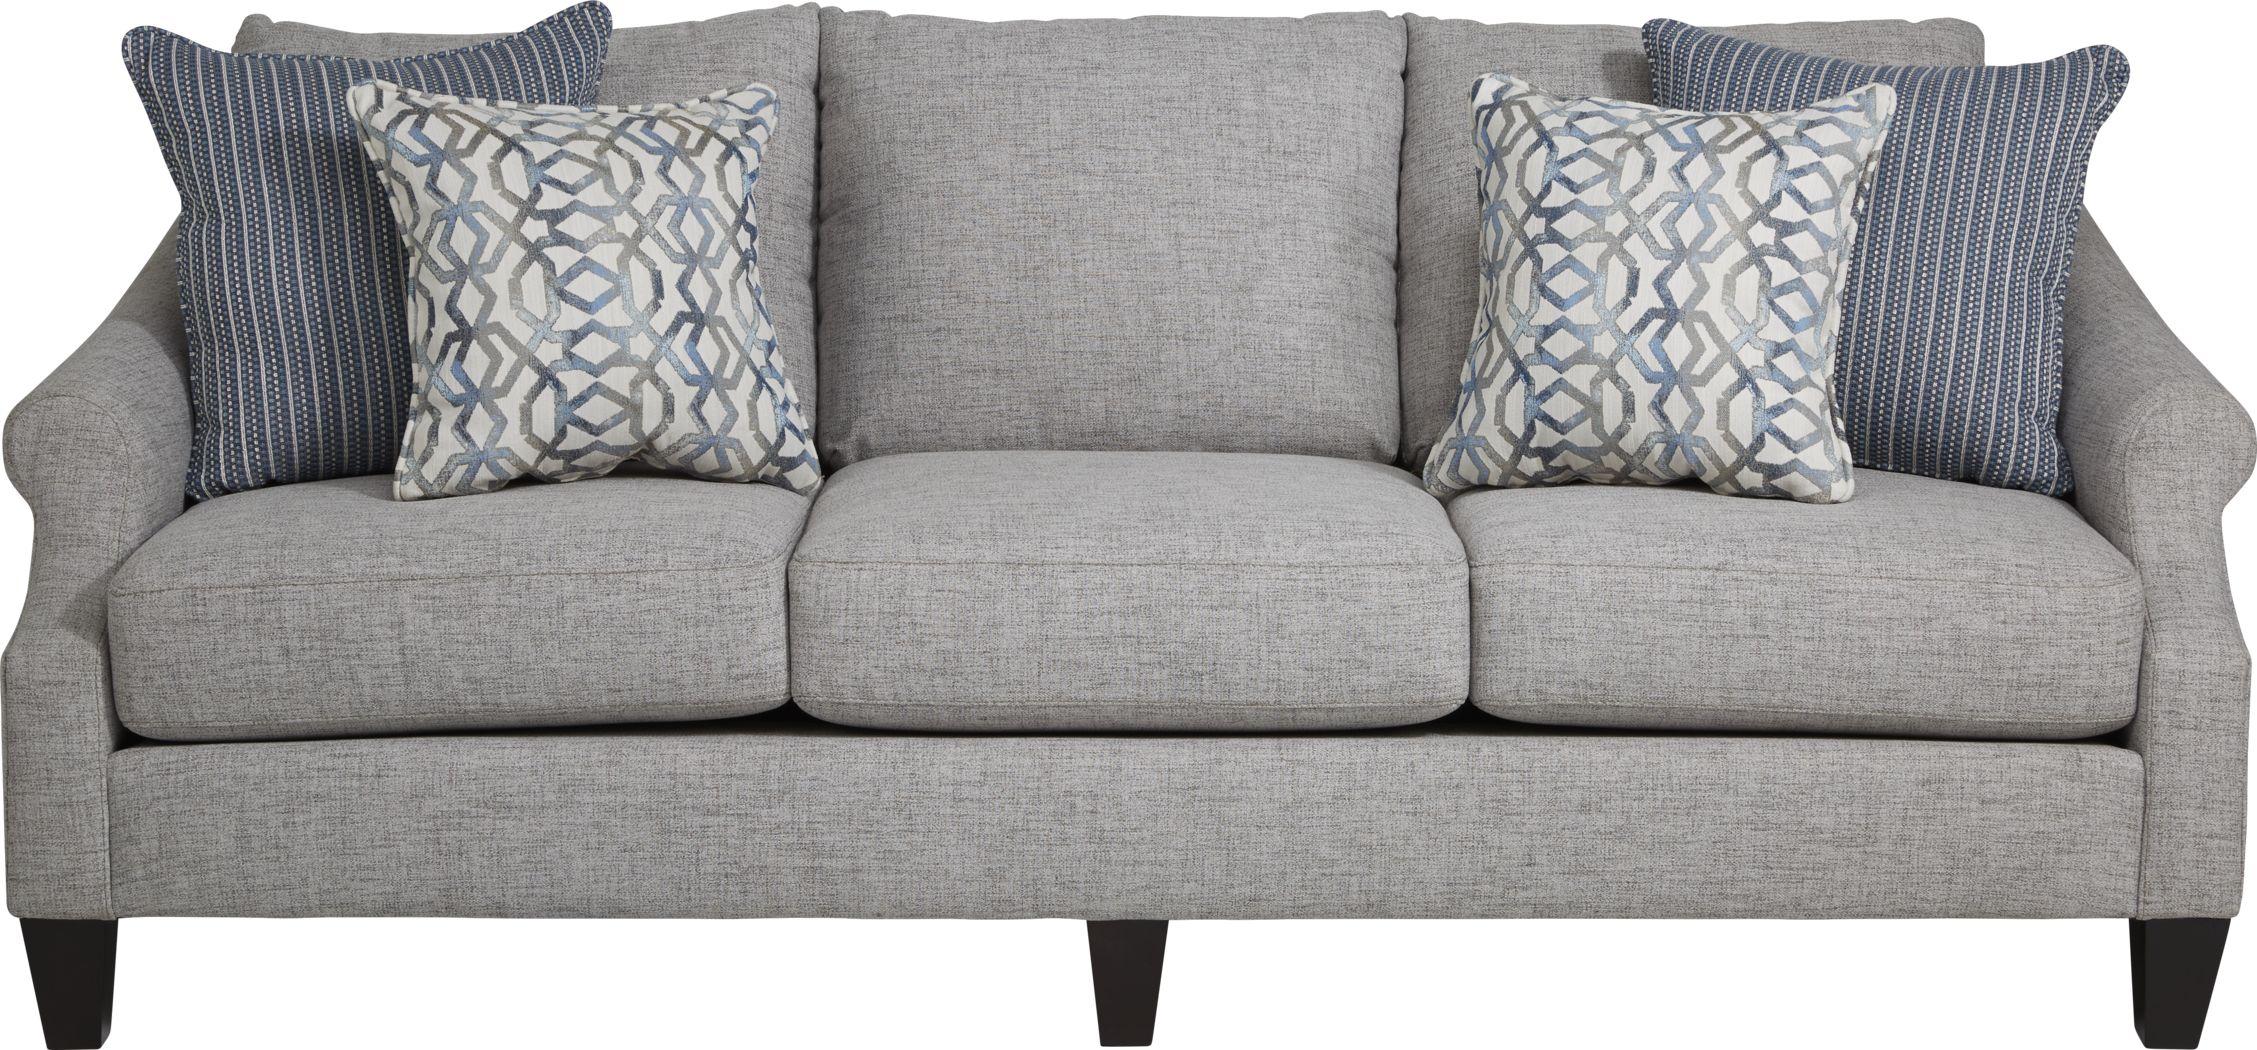 Westerfield Gray Sofa